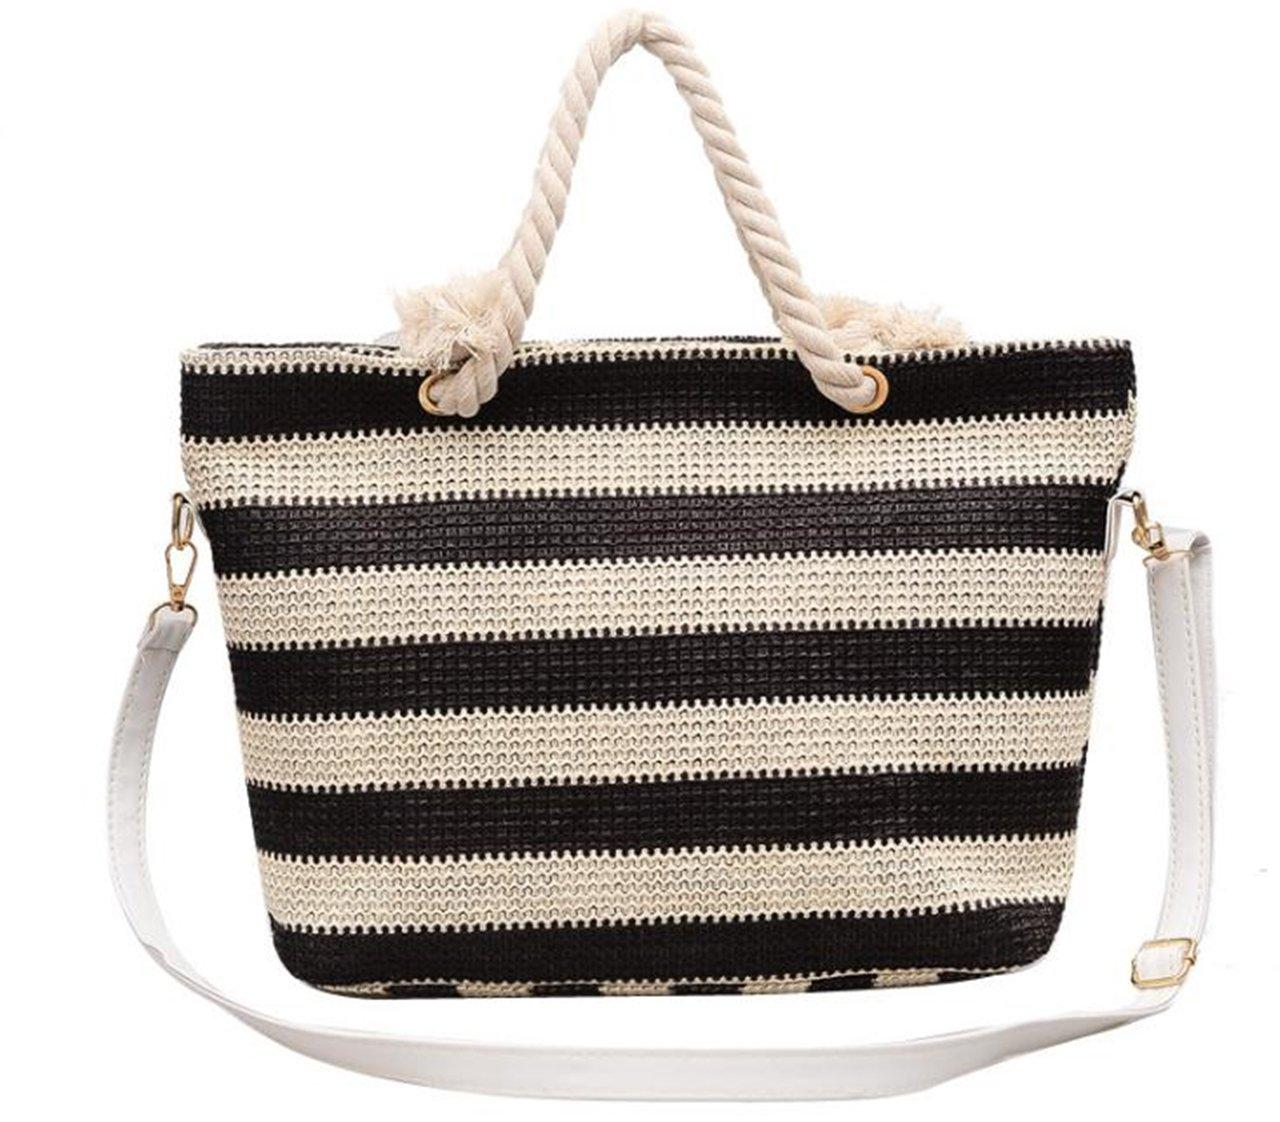 Women's straw beach bag 2 color weave single shoulder withTop Zipper Rope Handles Inner Pocket (Black)